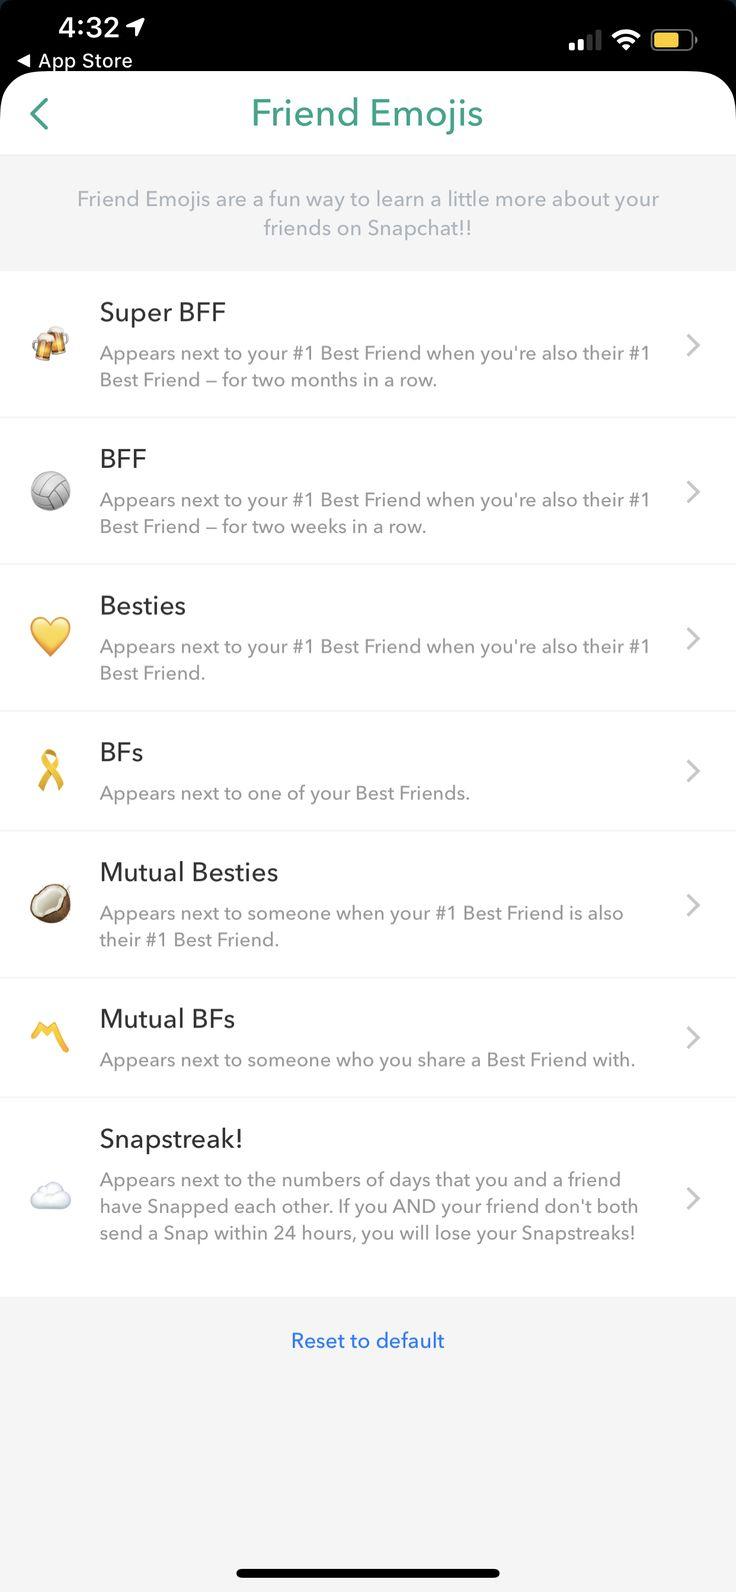 Pin by alex on snapchat Snapchat friend emojis, Snapchat